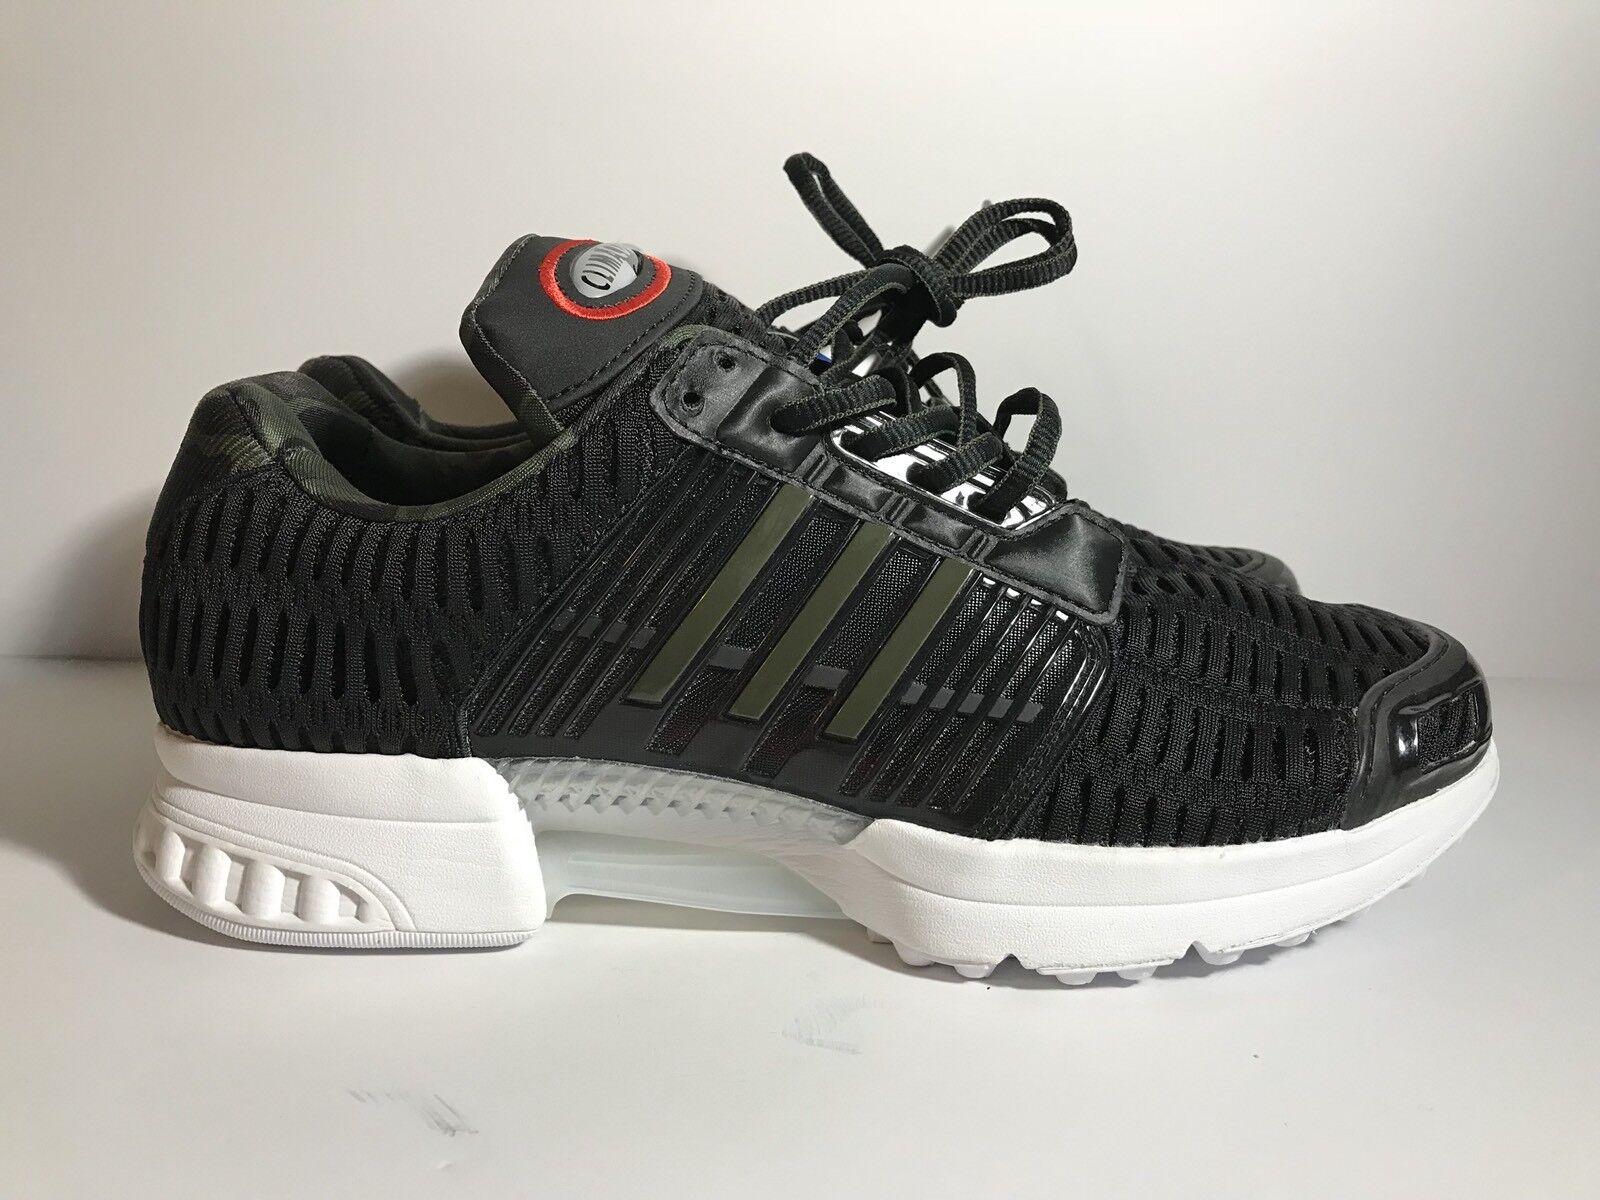 Adidas Originals Mens Climacool 1 Core Black/Night Cargo Sneaker White Size 10